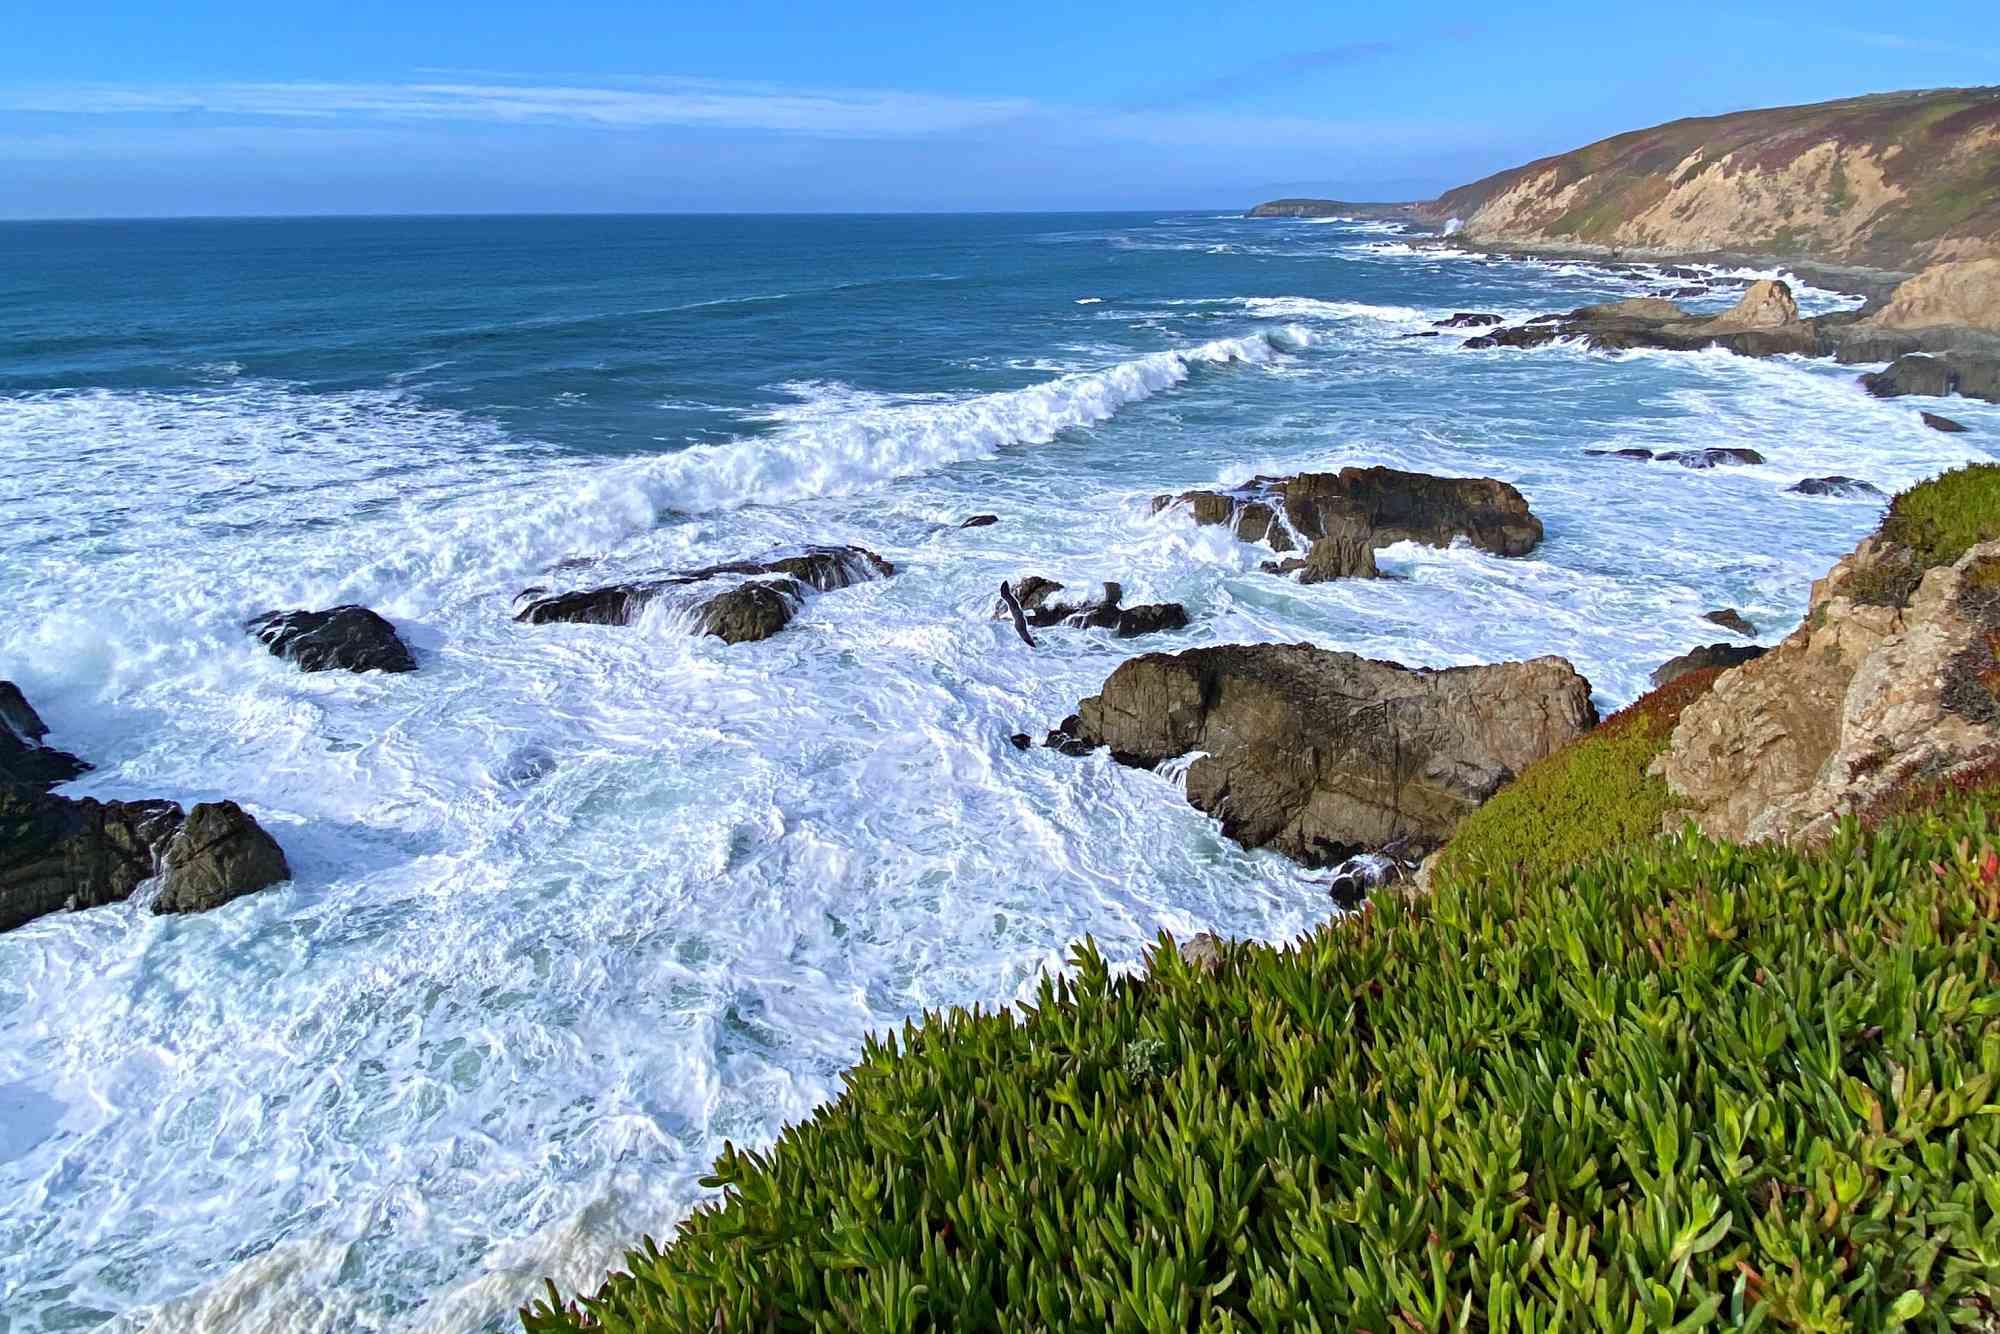 Bodega Bay Trailhead part of Sonoma Coast State Park in California